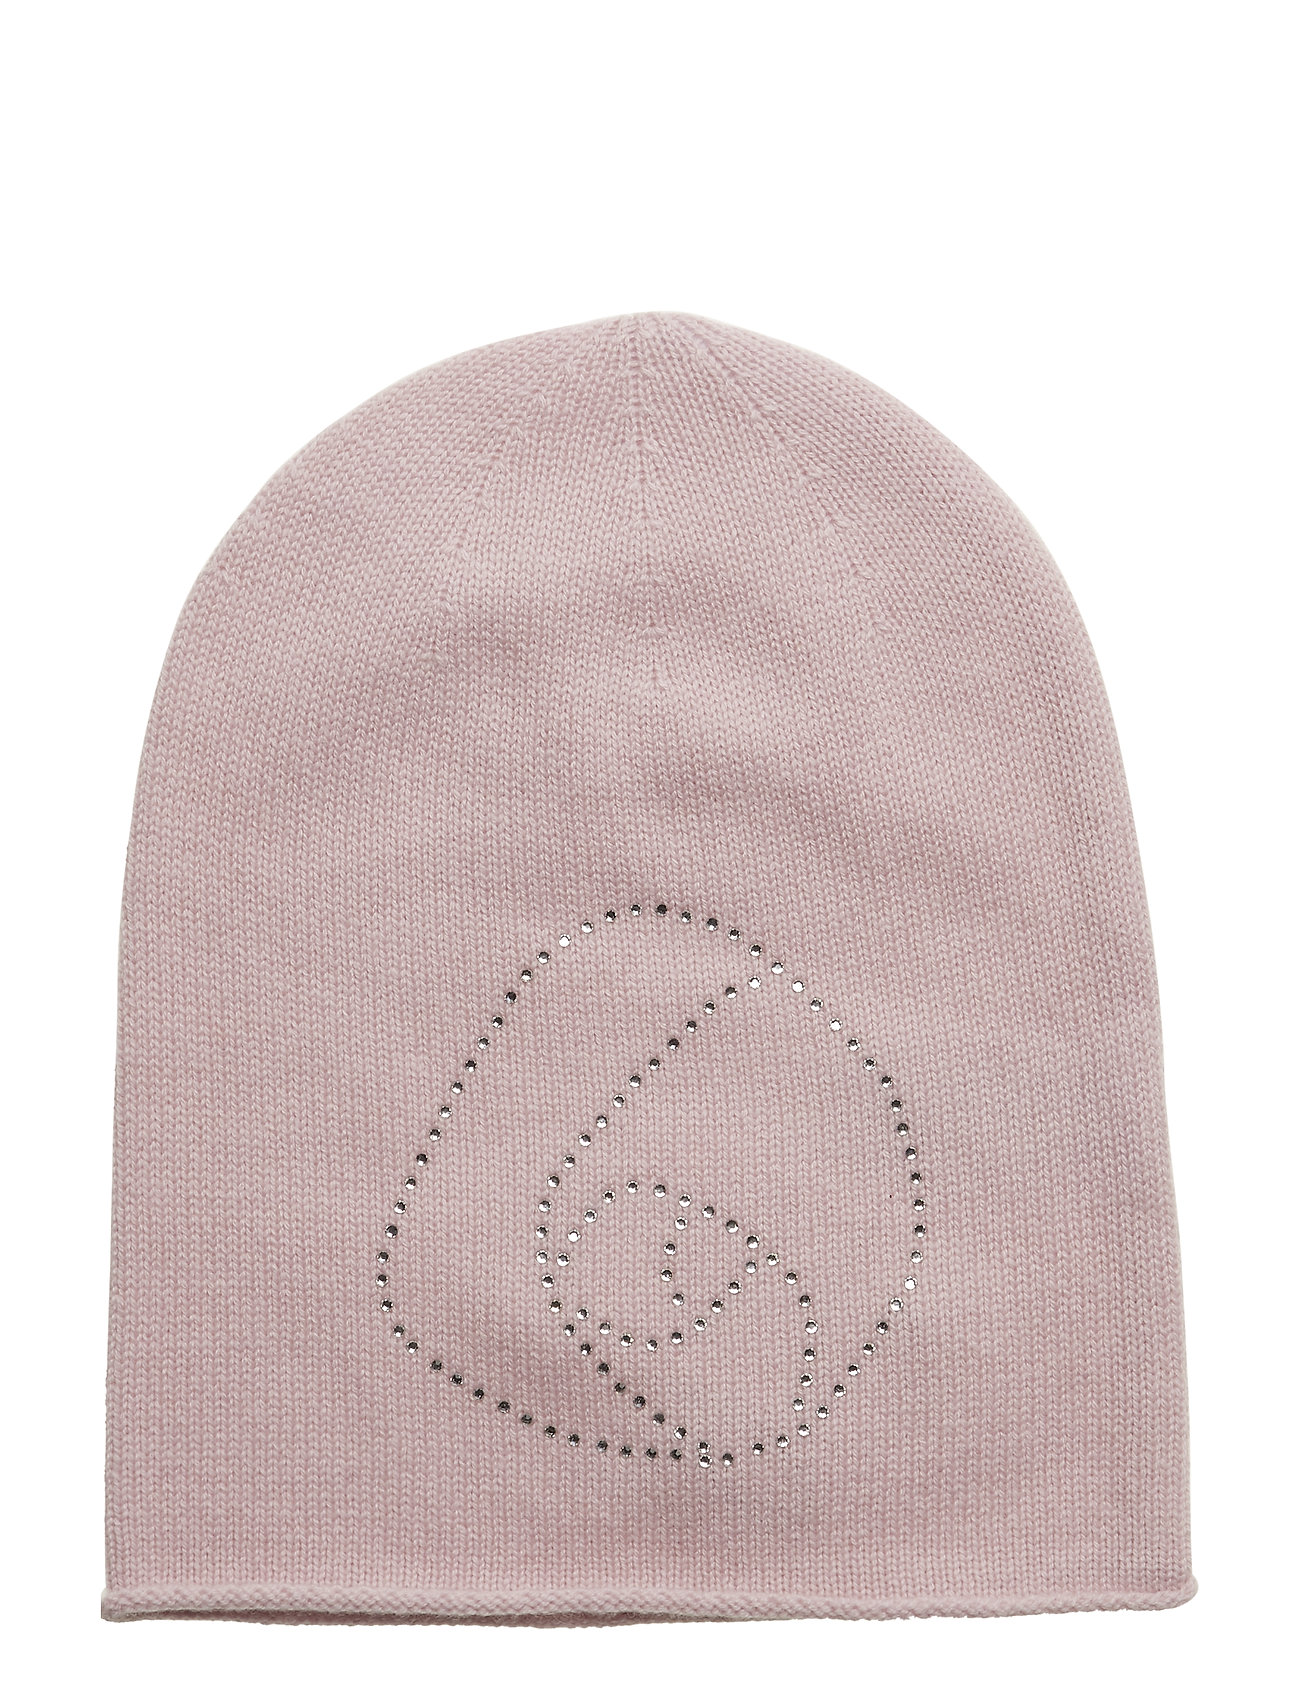 Image of Hat W/Rose Hue Lyserød ROSEMUNDE (3066191803)